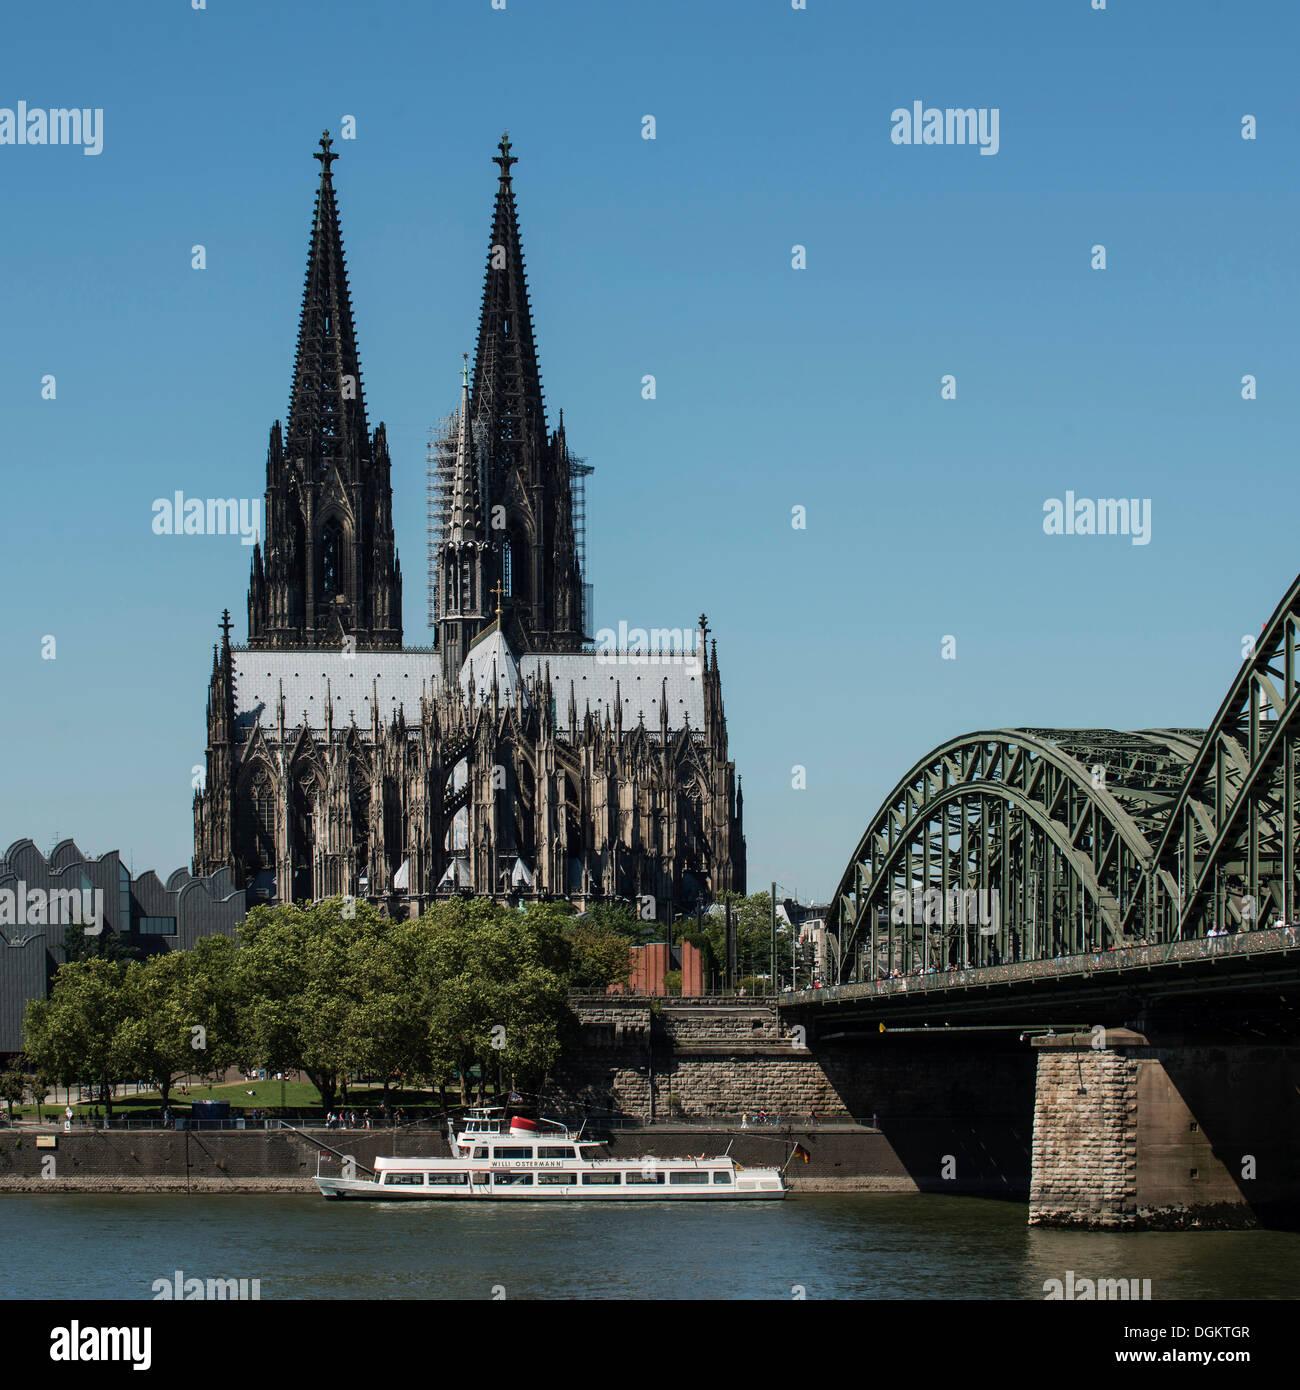 Ver como se ve desde Deutz sobre el río Rhin, puente Hohenzollernbruecke, Willi Ostermann excursión en barco en primer plano Imagen De Stock